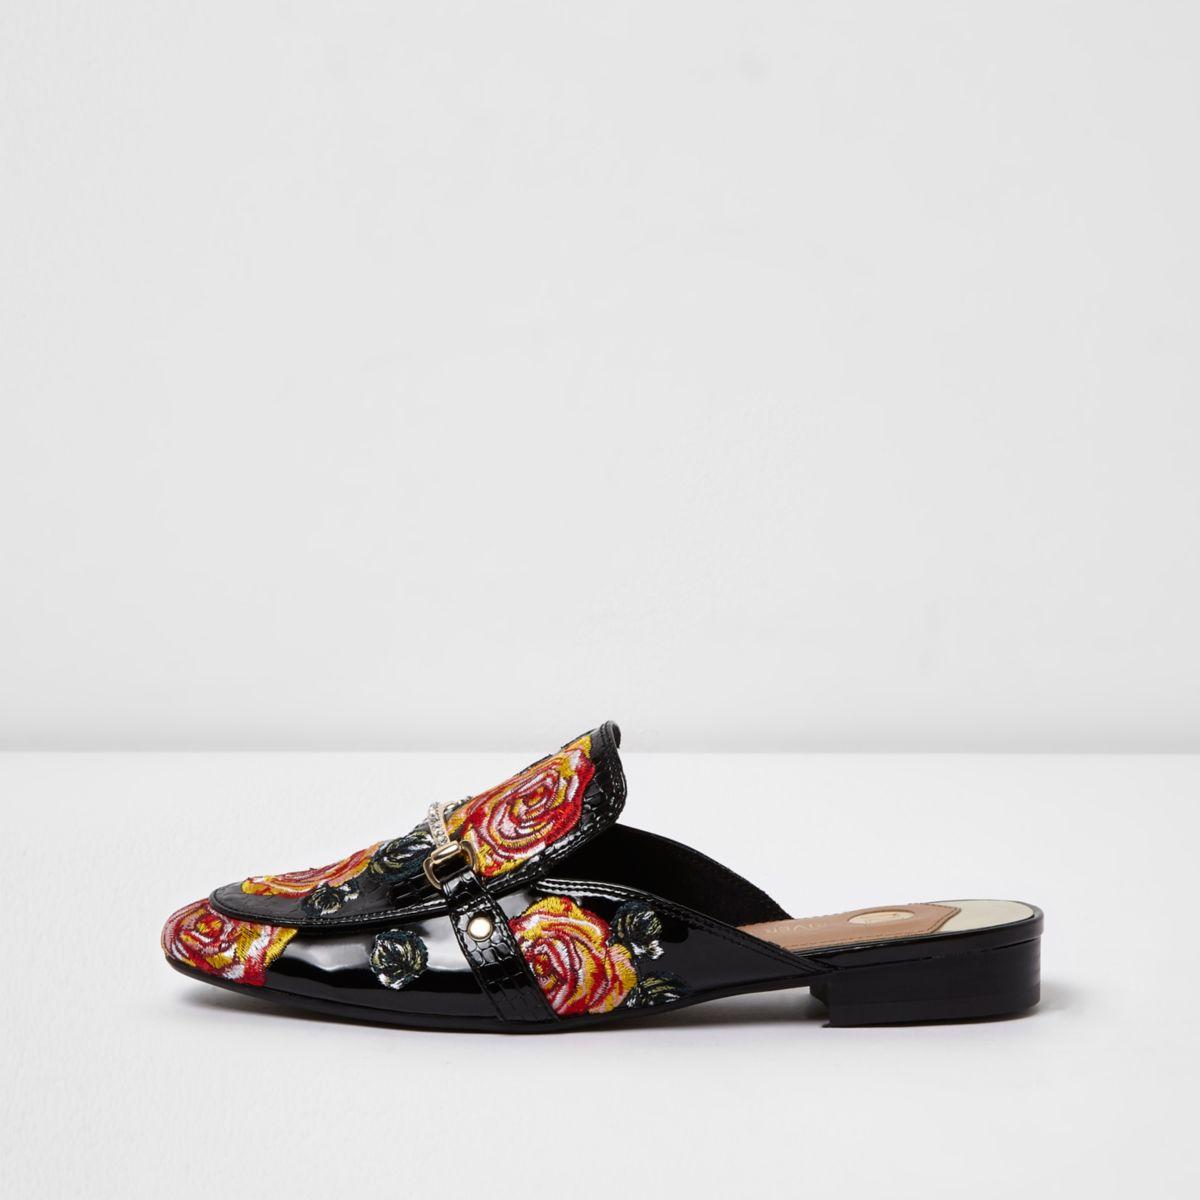 Schwarze Lack-Loafer mit Rosenapplikation